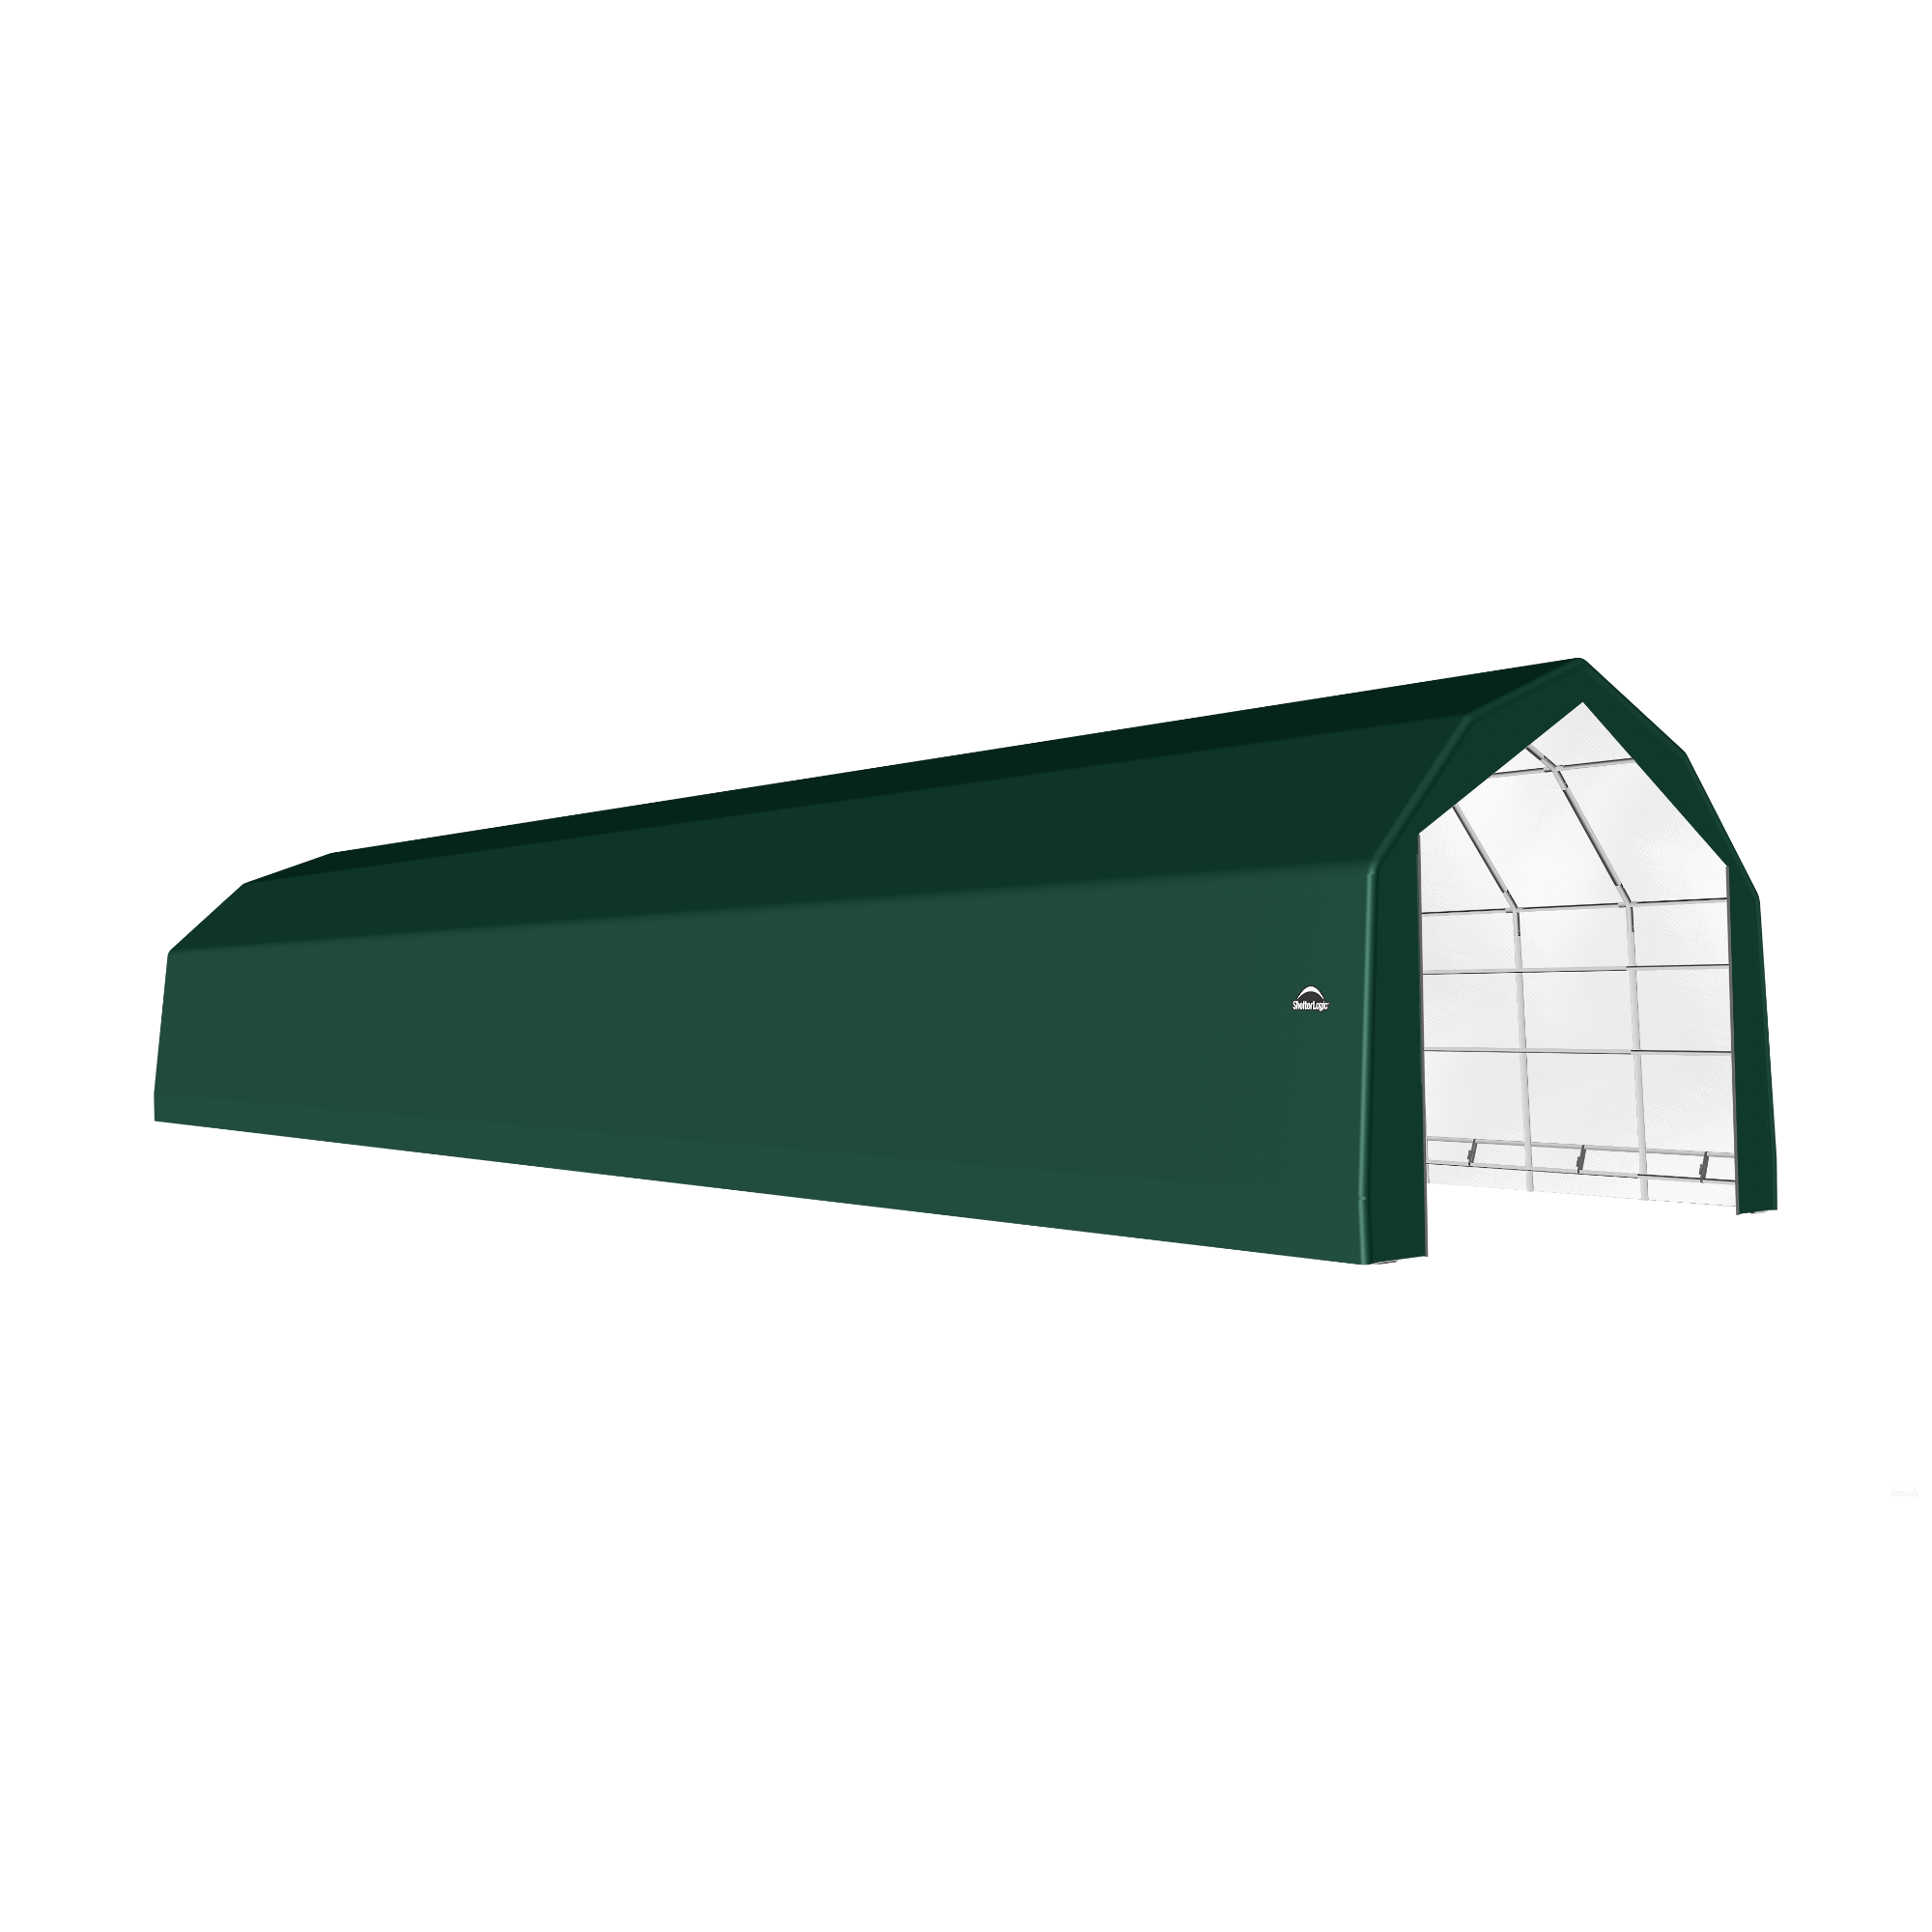 SP Barn 20X84X15 Green 14 oz PE Shelter